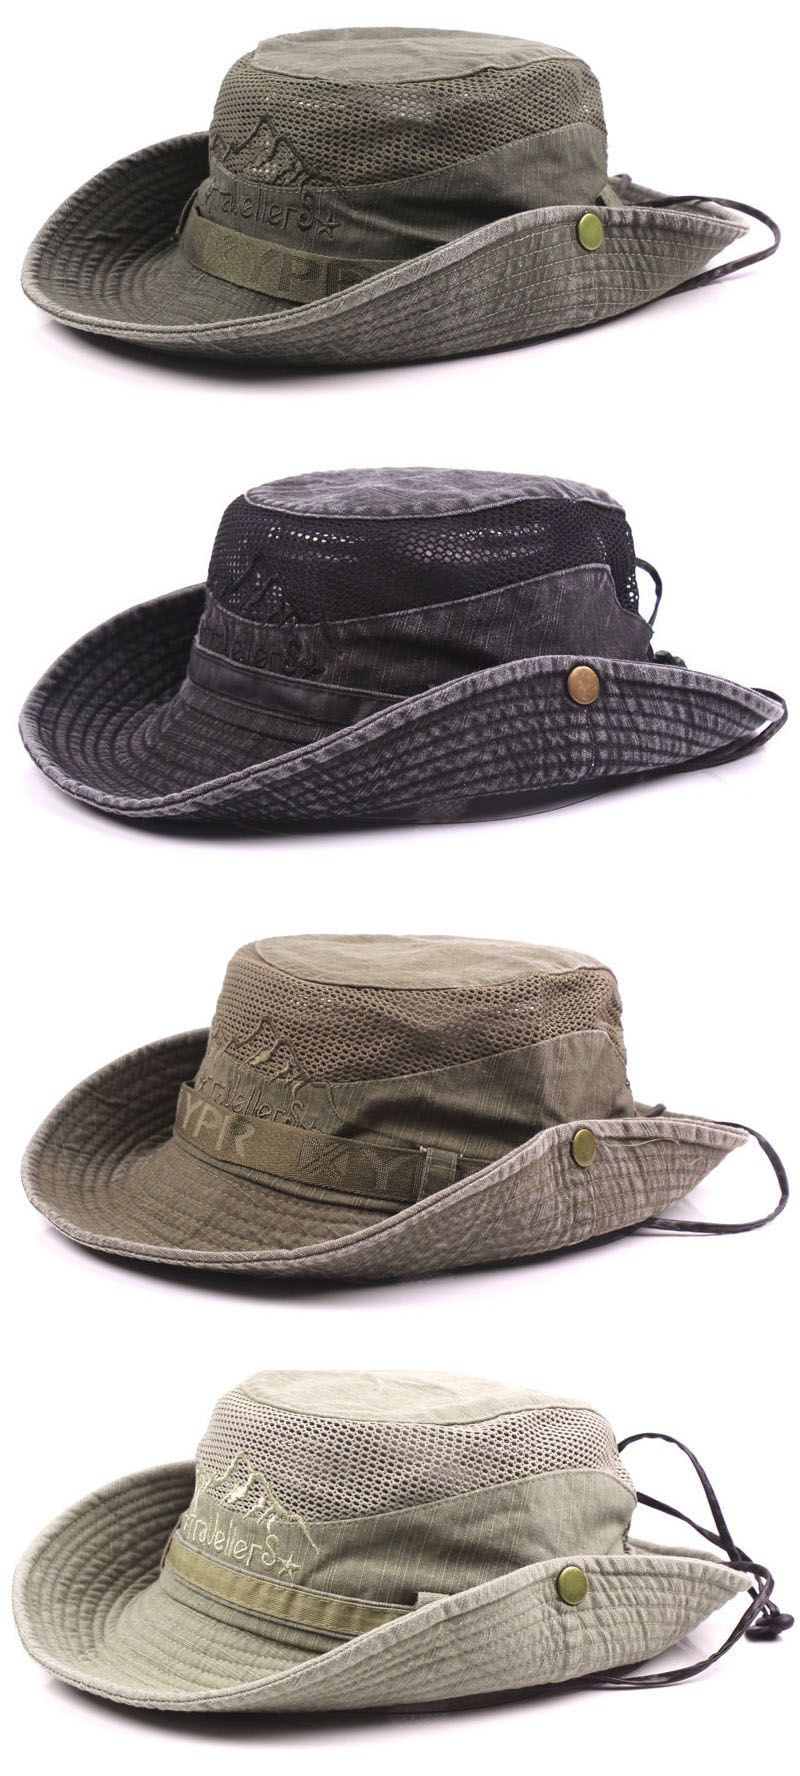 abf4b9244ea Mens Summer Cotton Embroidery Visor Bucket Hats Fisherman Hat Outdoor  Climbing Mesh Sunshade Cap